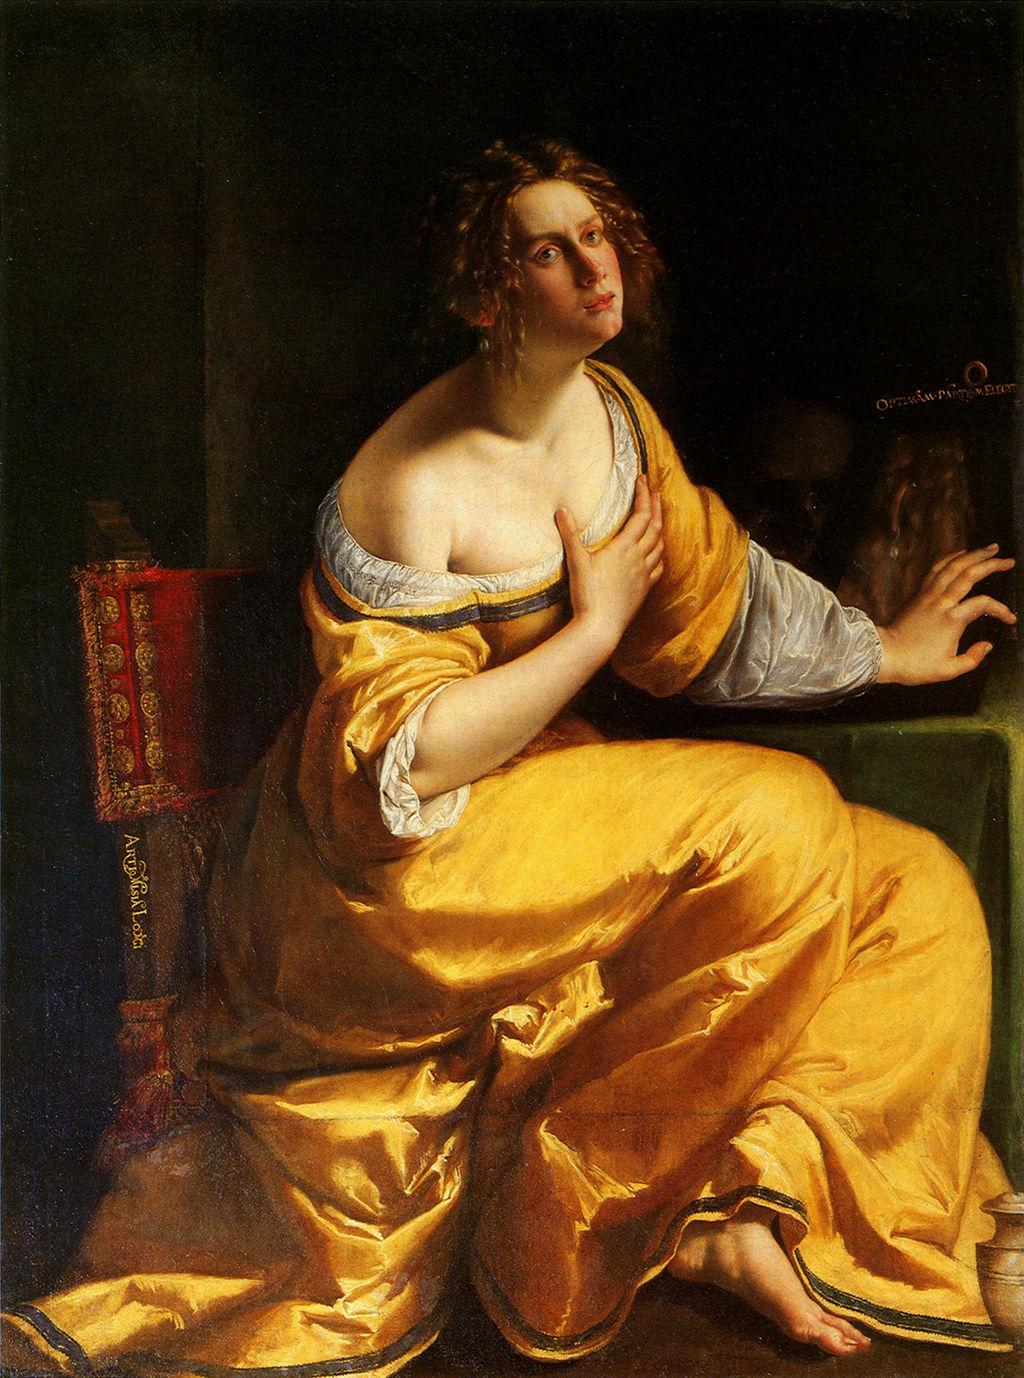 Artemisia_Gentileschi_Mary_Magdalene_Pitti.jpg